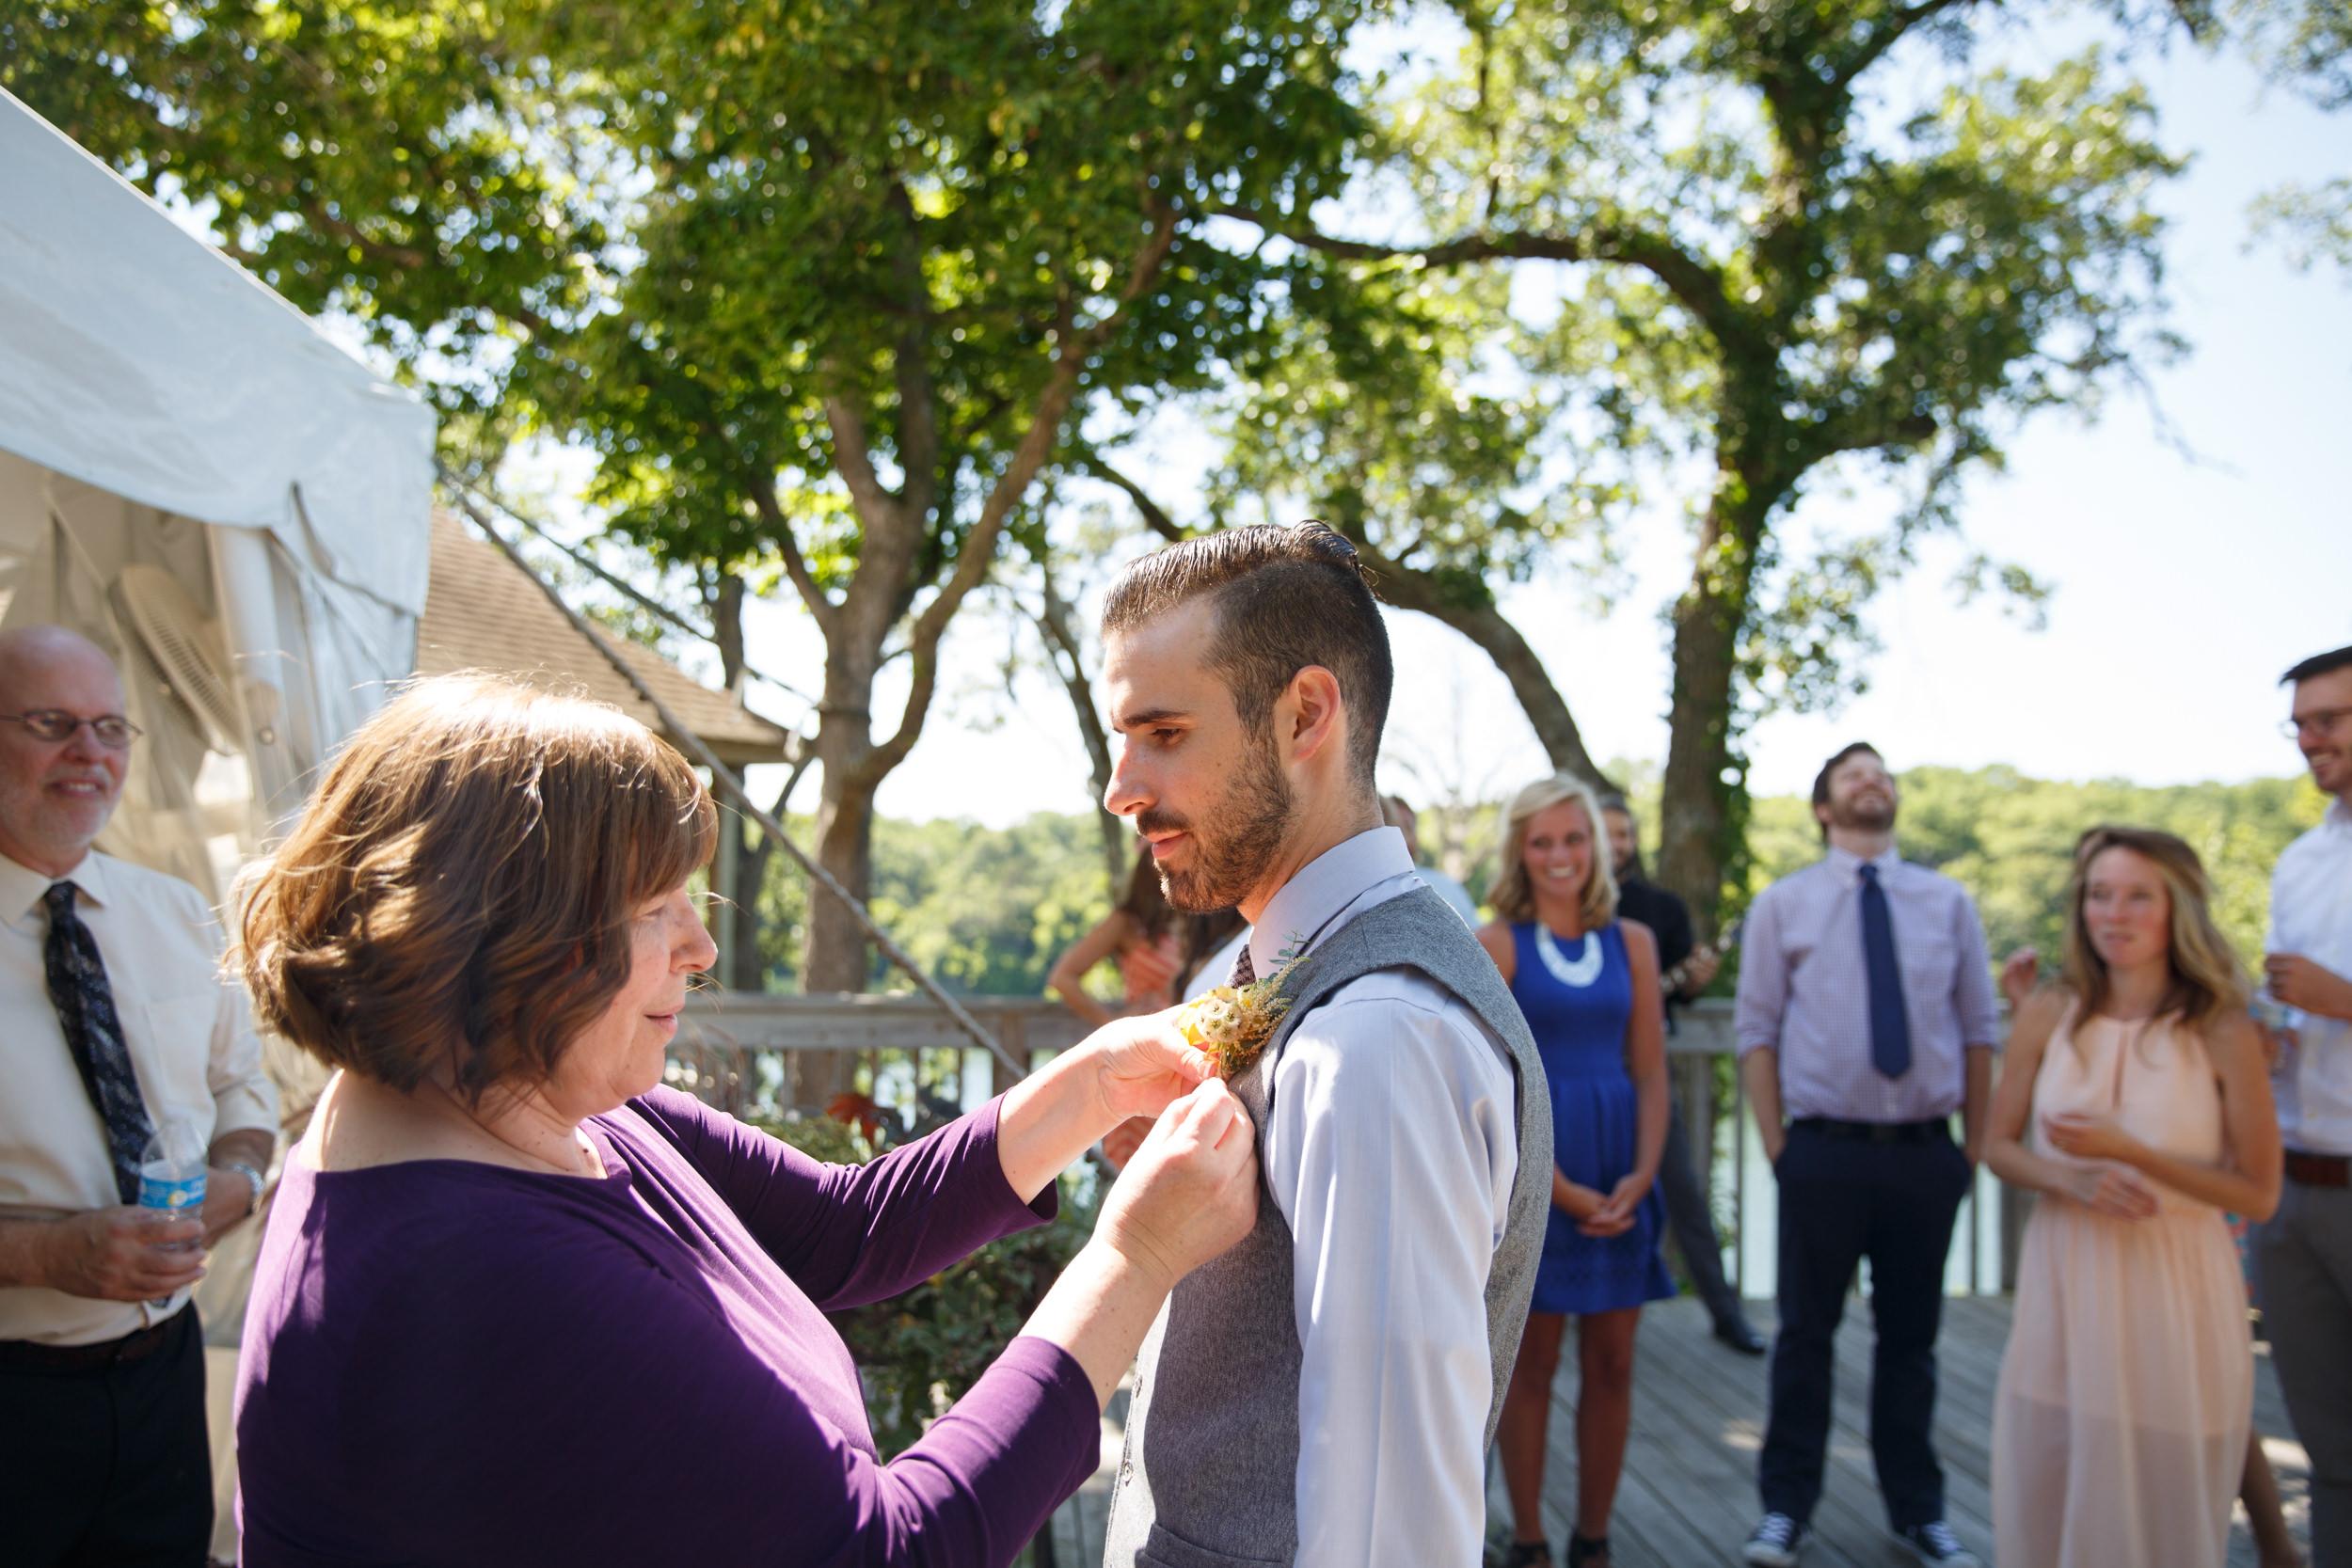 7-25-2015 Sarah and Jimmy's Eagle Ridge Downtown Galena Wedding-136.jpg